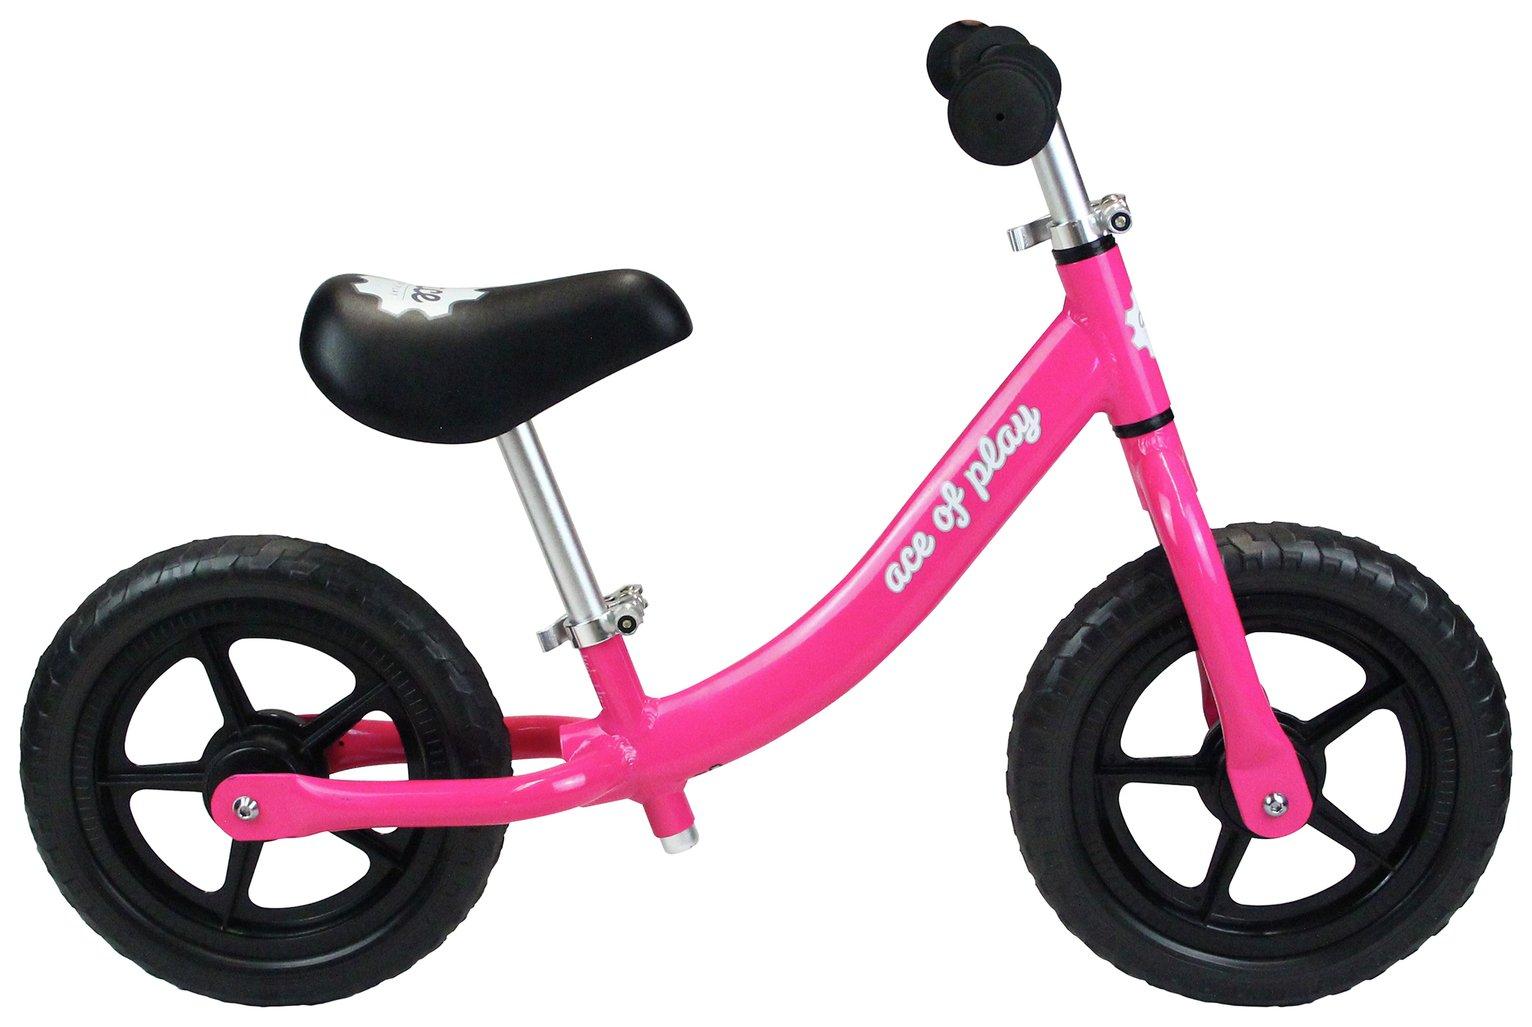 Ace of Play Balance Bike - Pink